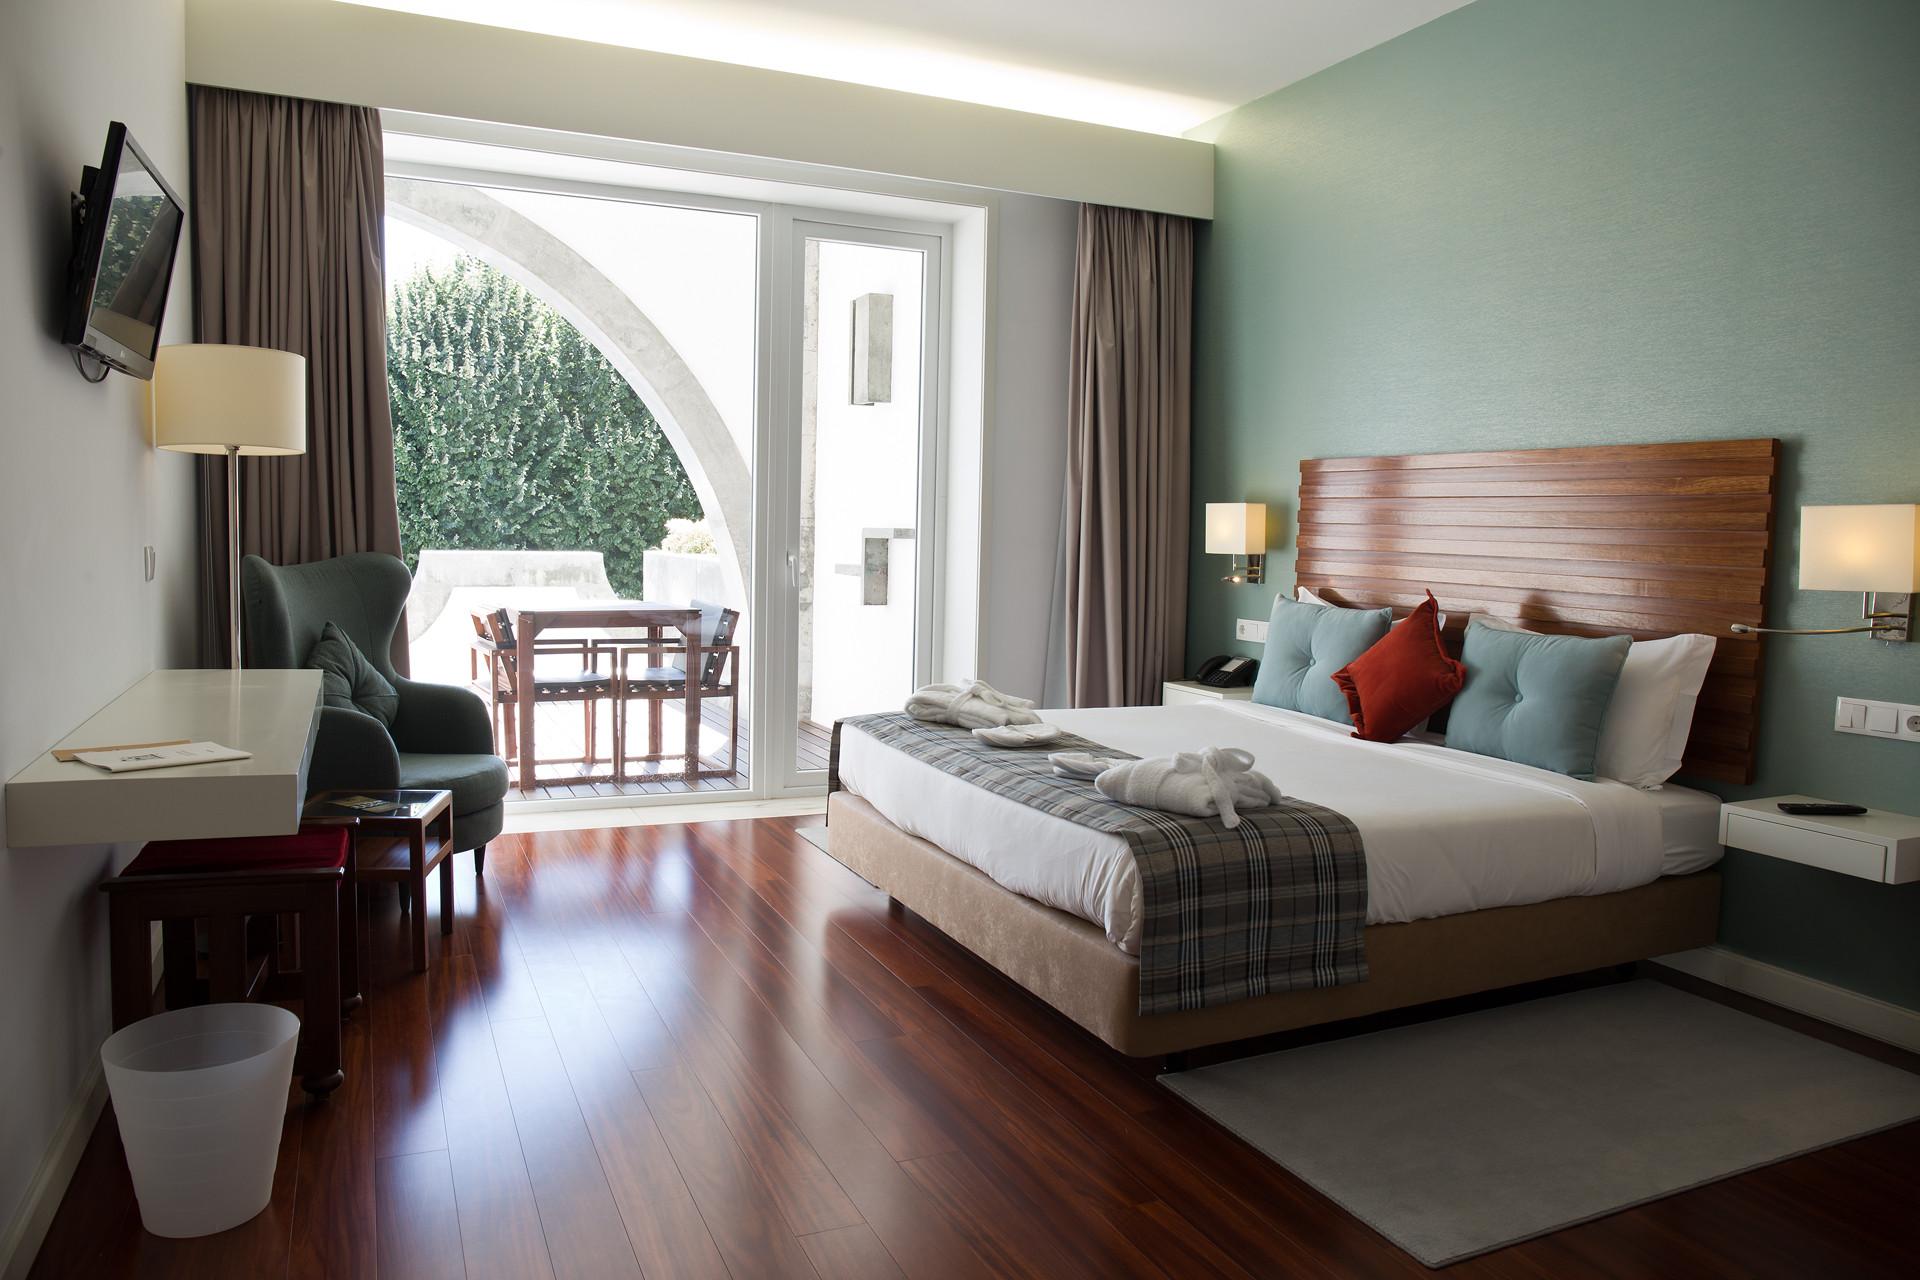 Rent By Room In Gerês Hotel S Bento Quarto Duplo Hidromassagem